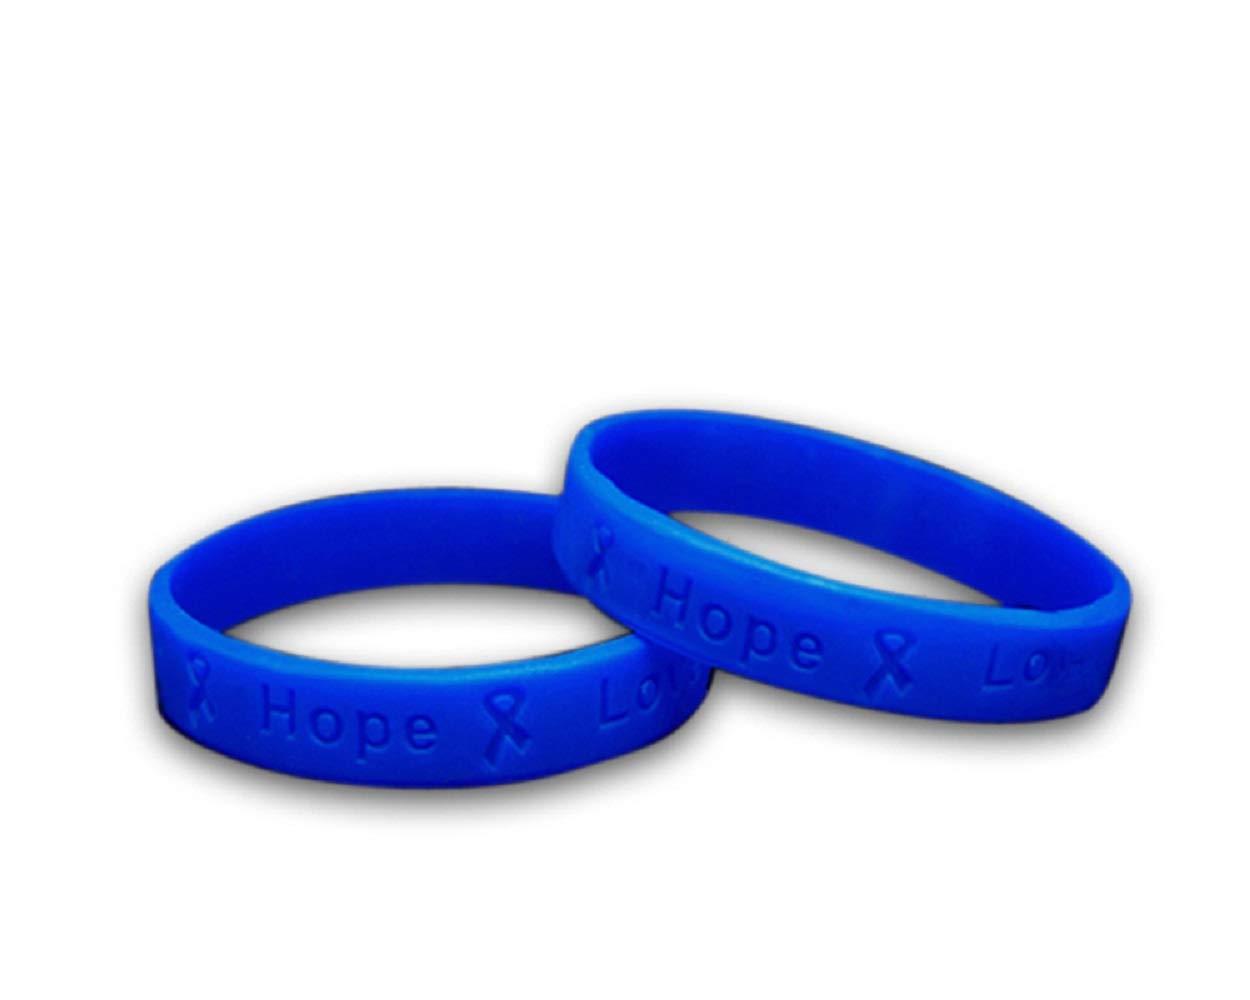 50 Pack Colon Cancer Awareness Silicone Bracelets - Adult Size (Wholesale Pack - 50 Bracelets)